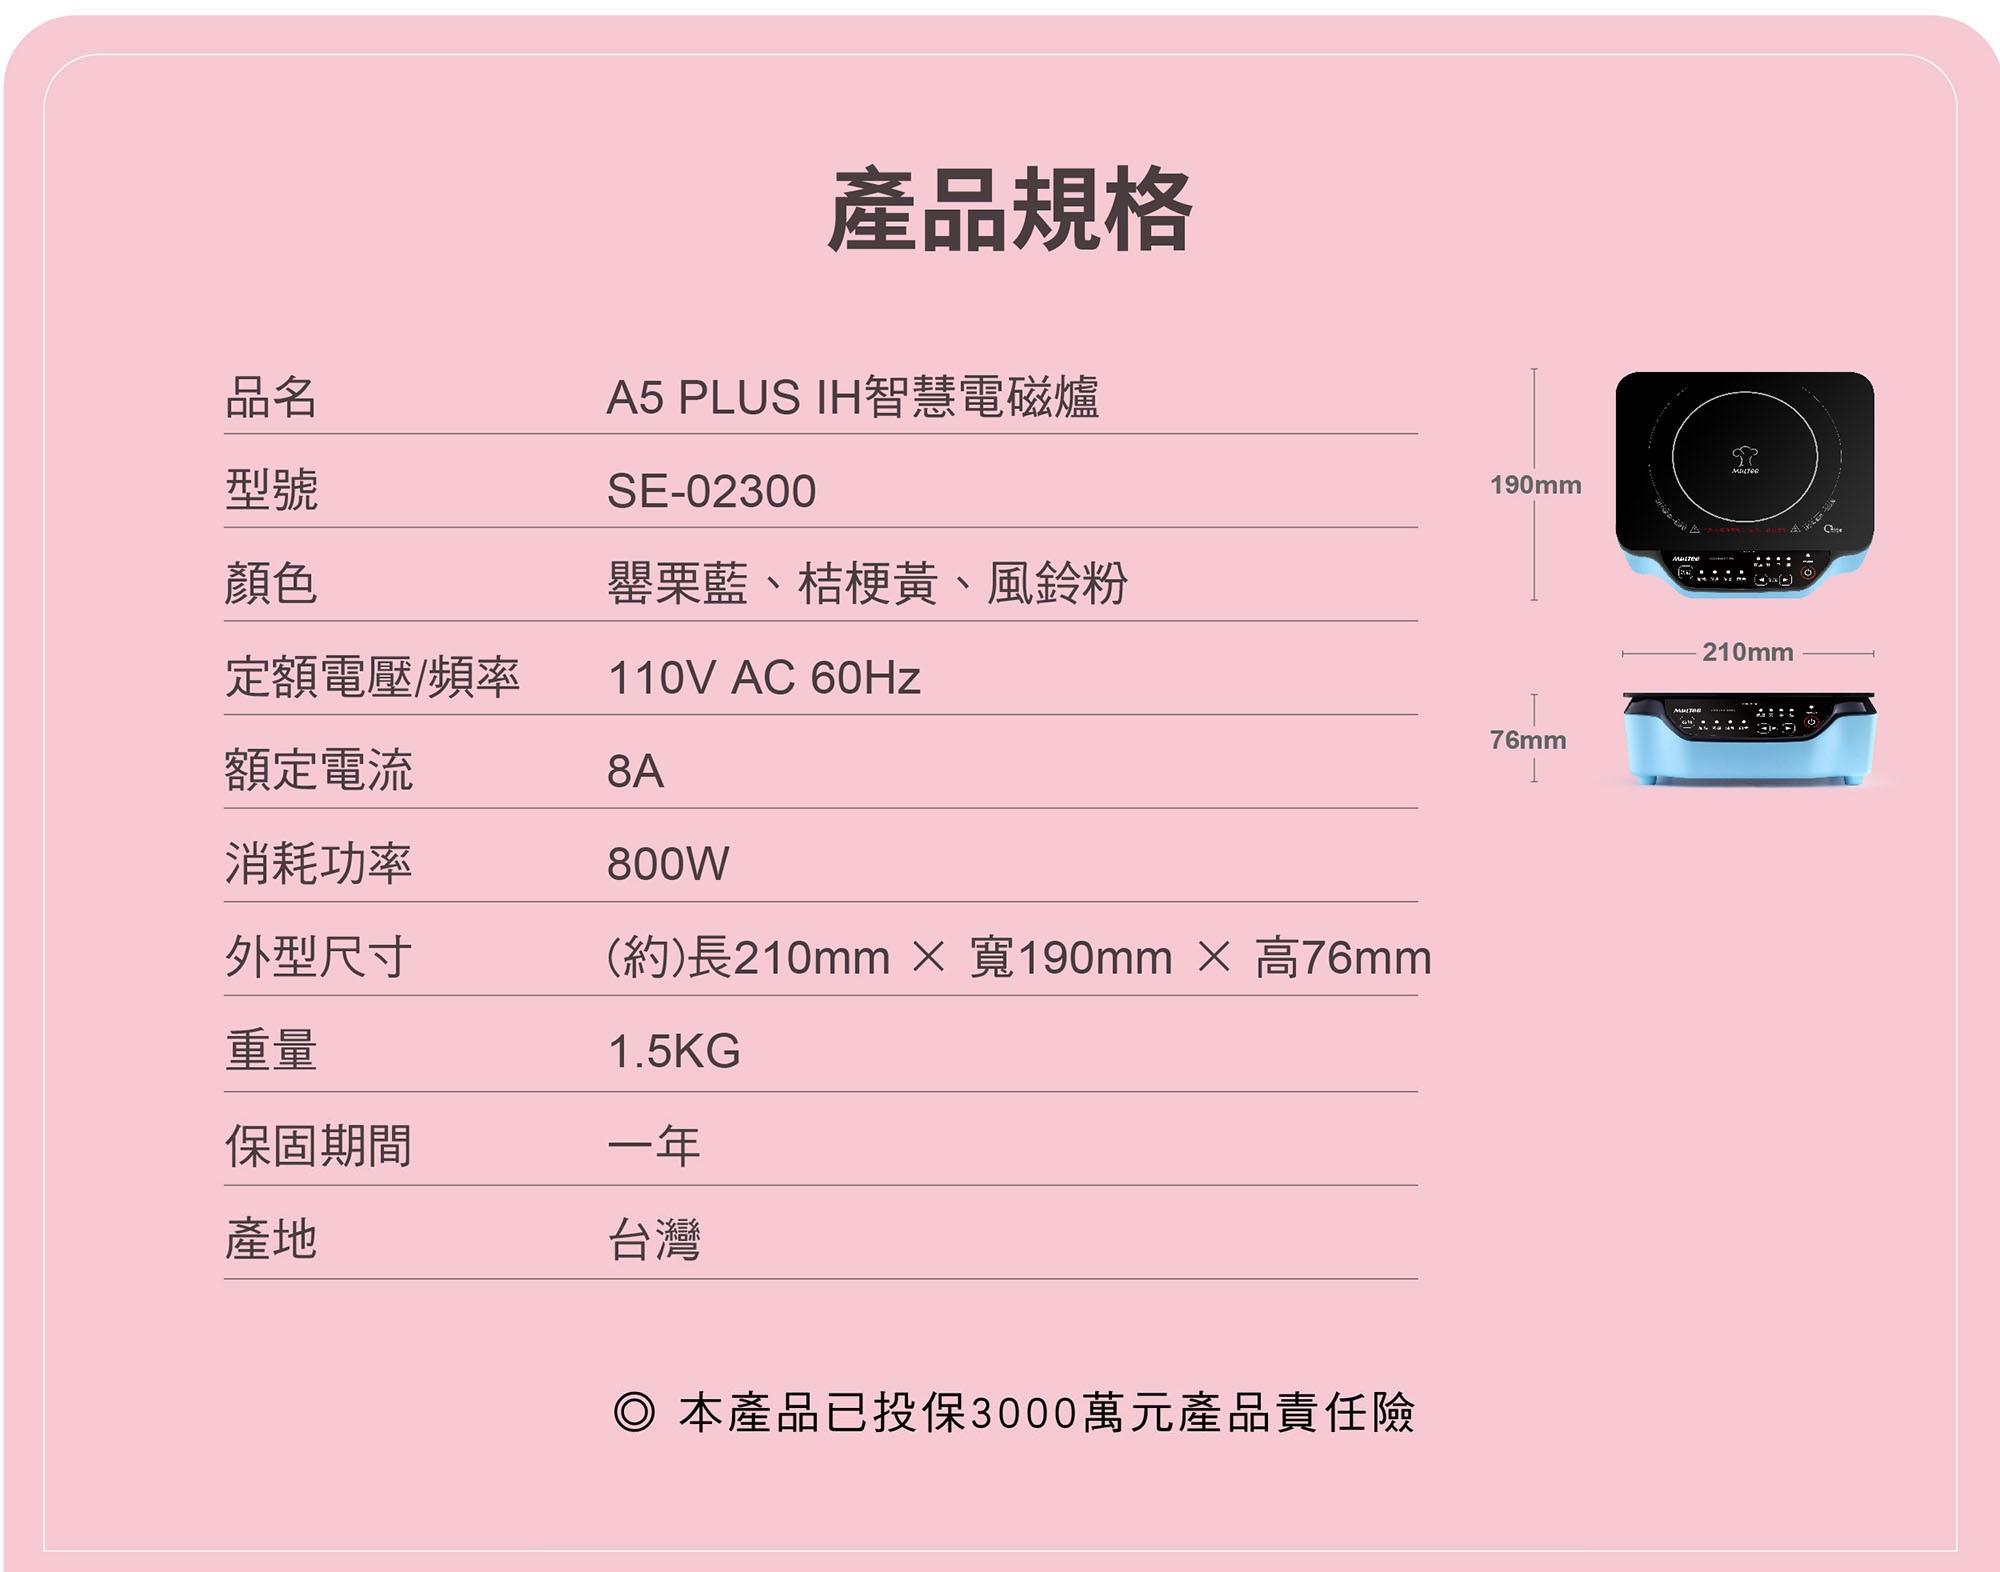 A5 PLUS IH-14.jpg